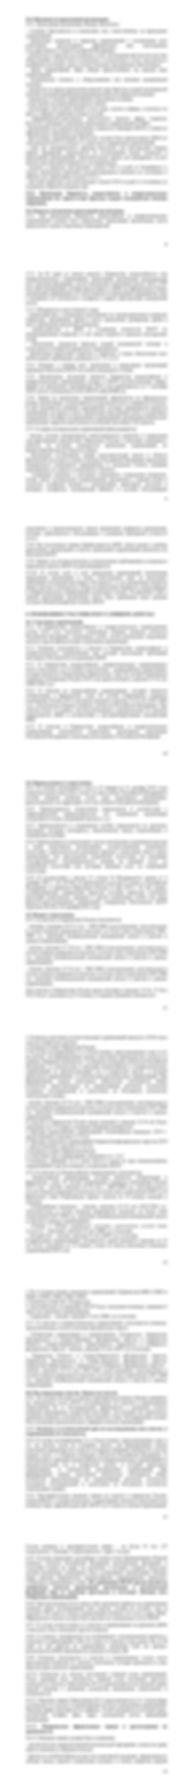 регламент 8.14.jpg